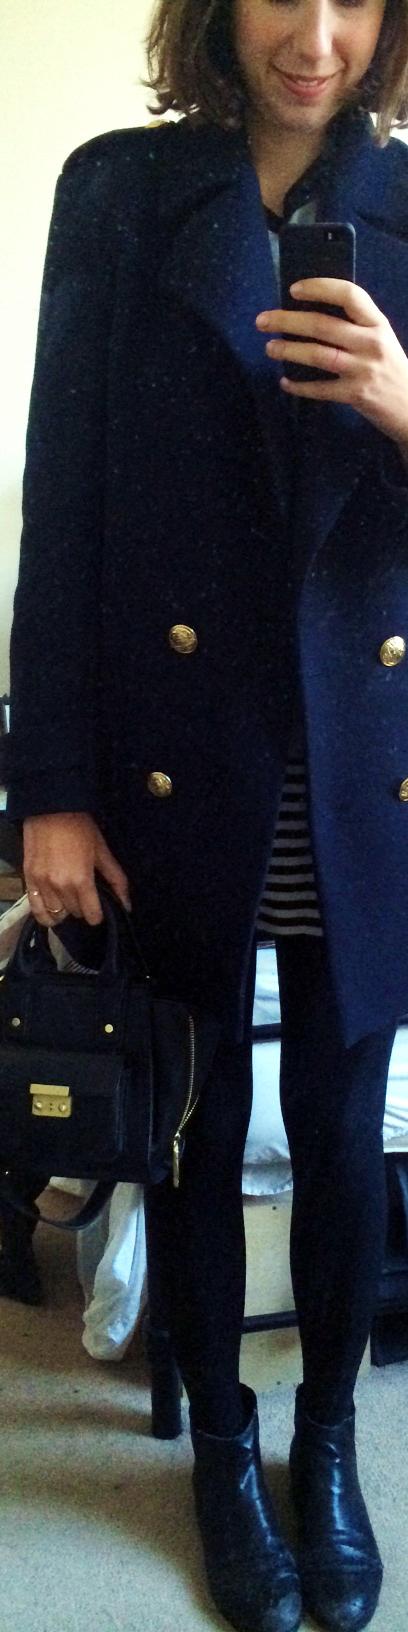 Striped Dress  ,   ZARA Pea Coat  ,   Marais USA Chelsea Boots  , Phillip Lim for Target Mini Satchel